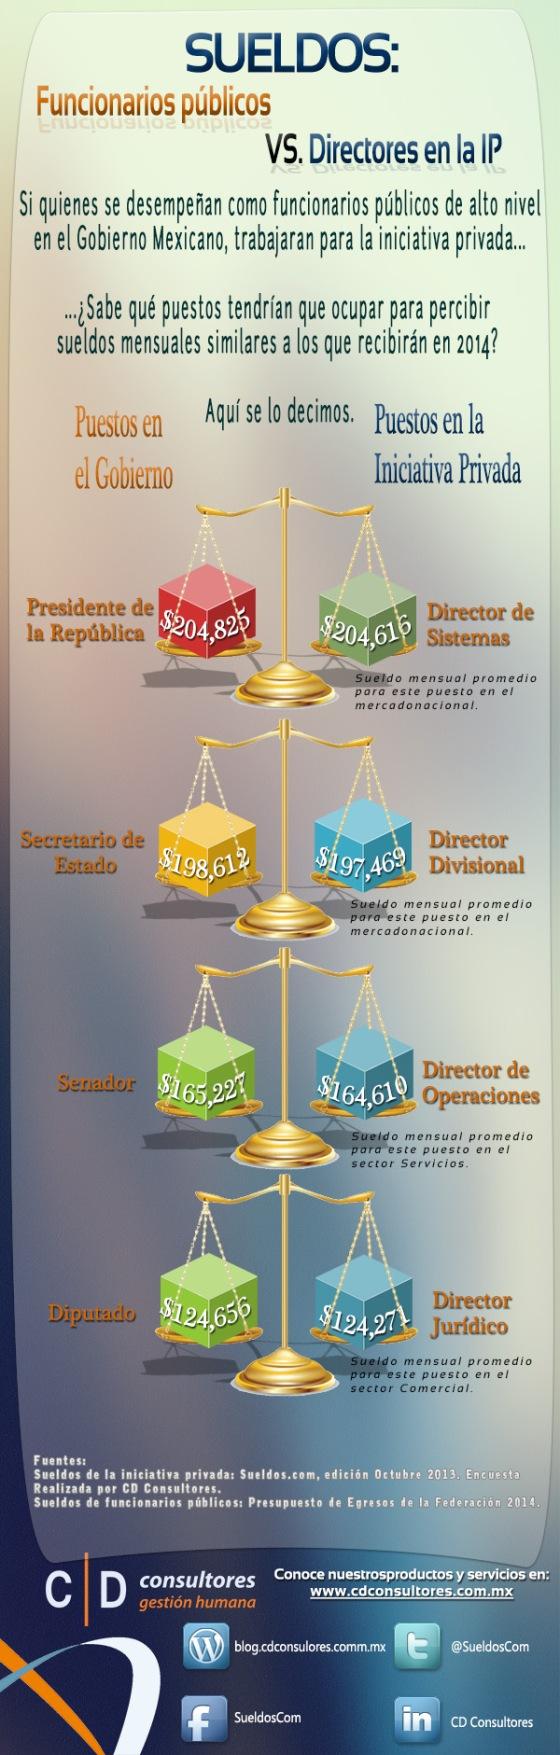 Gobierno vs. IP